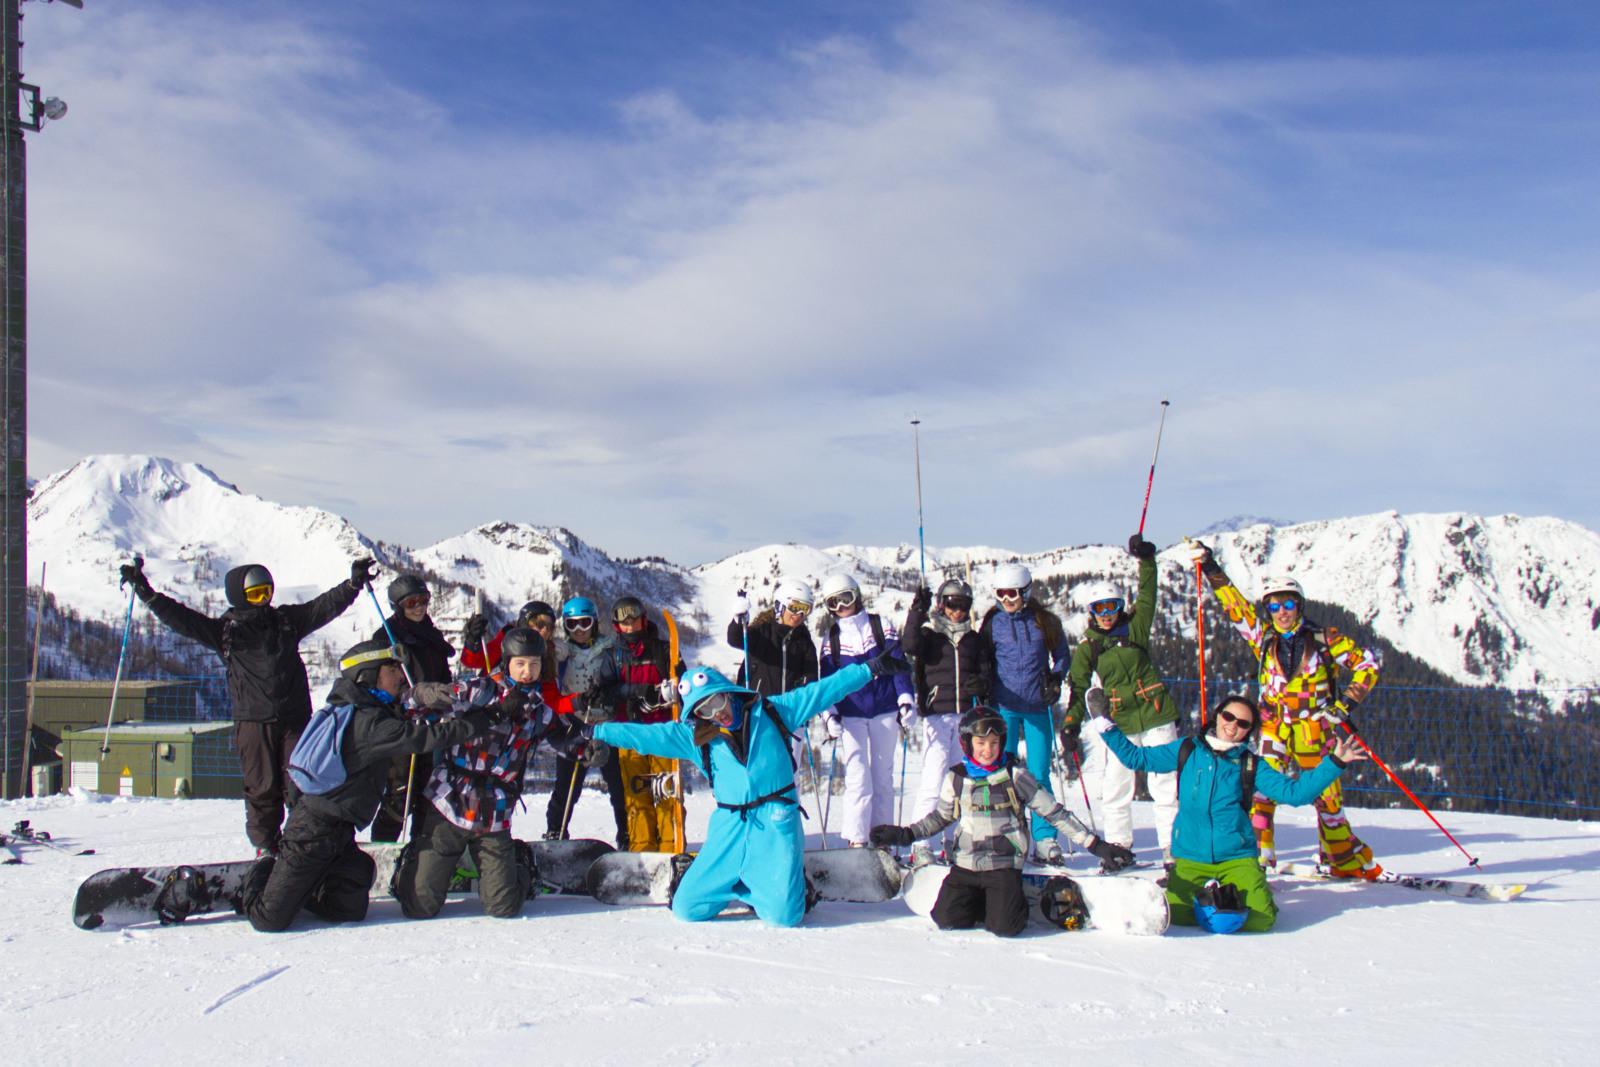 [2022] Snowboarden in uitdagend skigebied - Krokus - Radstadt (Simonyhof)